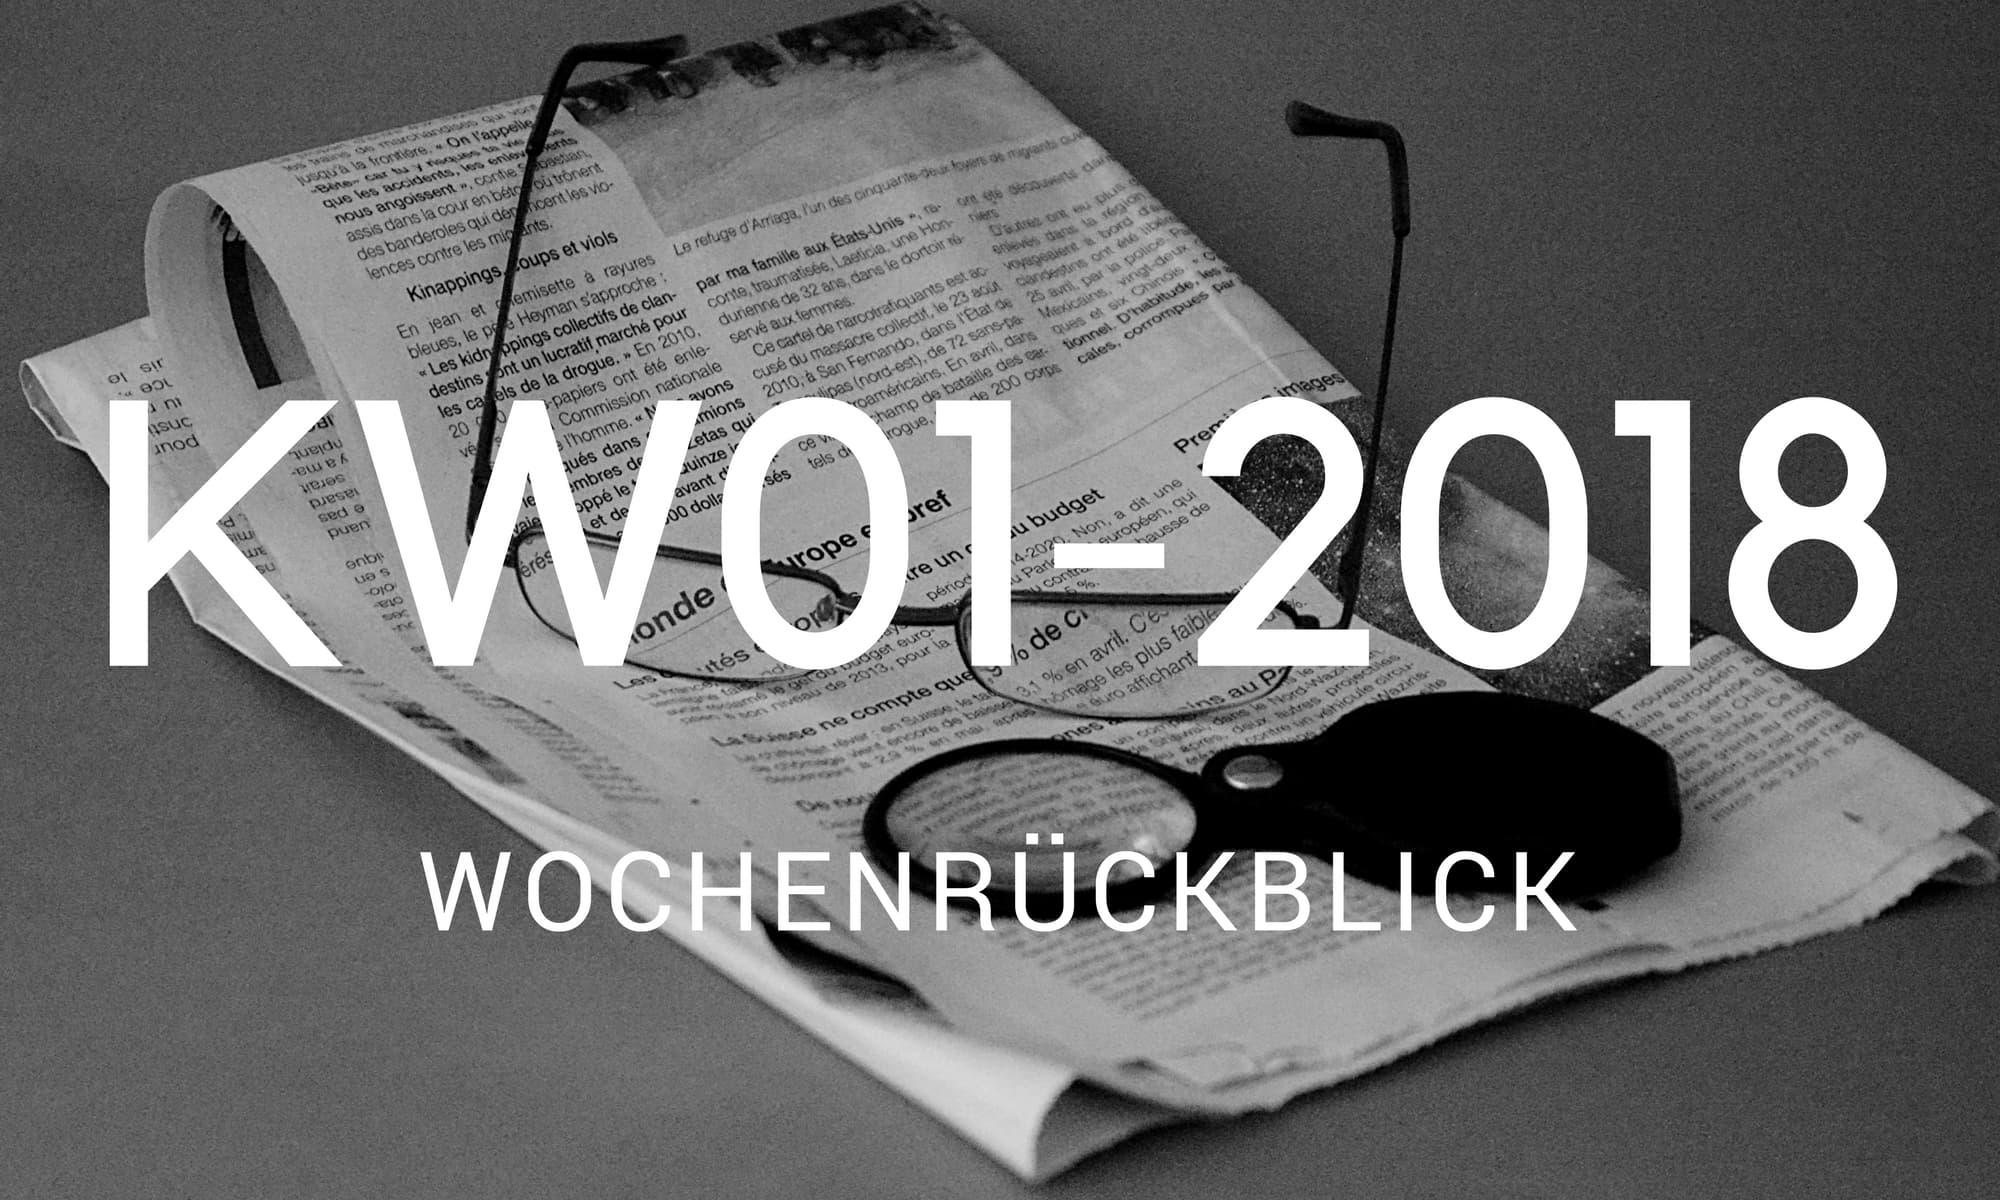 wochenrueckblick camping news KW01 2018